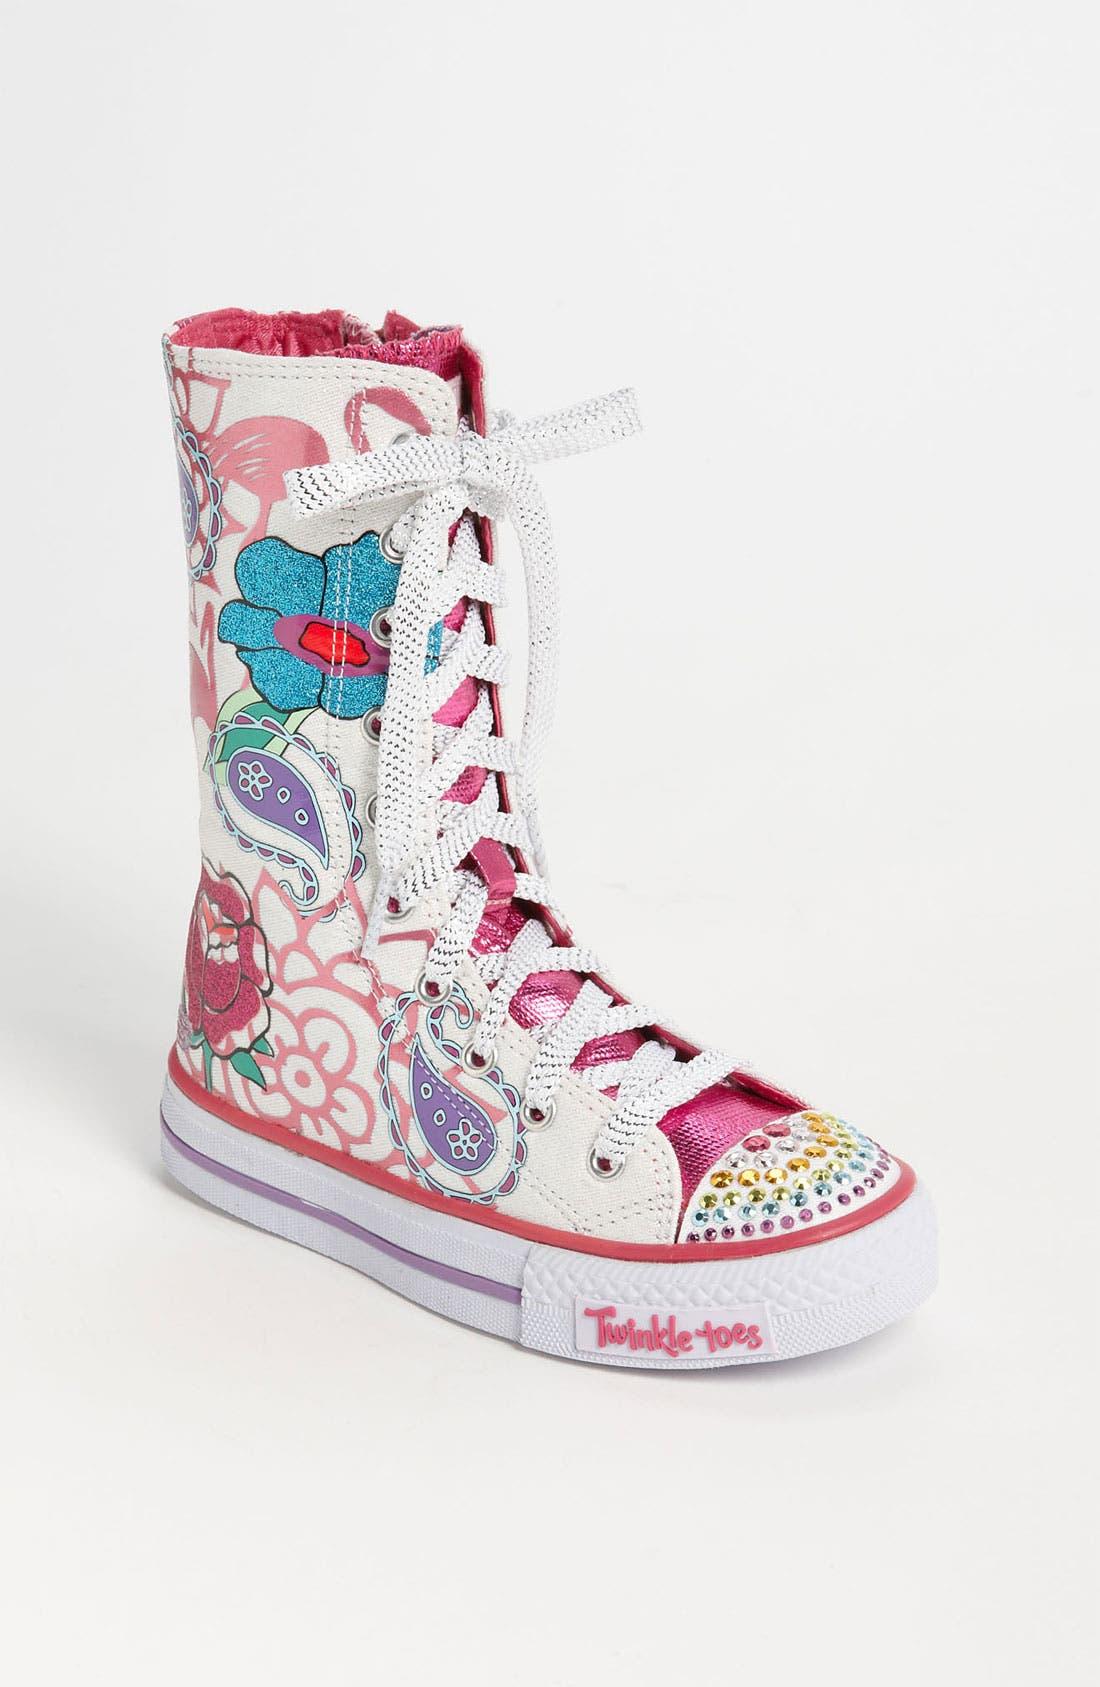 Alternate Image 1 Selected - SKECHERS 'Twinkle Toes - Shuffles Mellow Me' Sneaker (Toddler & Little Kid)